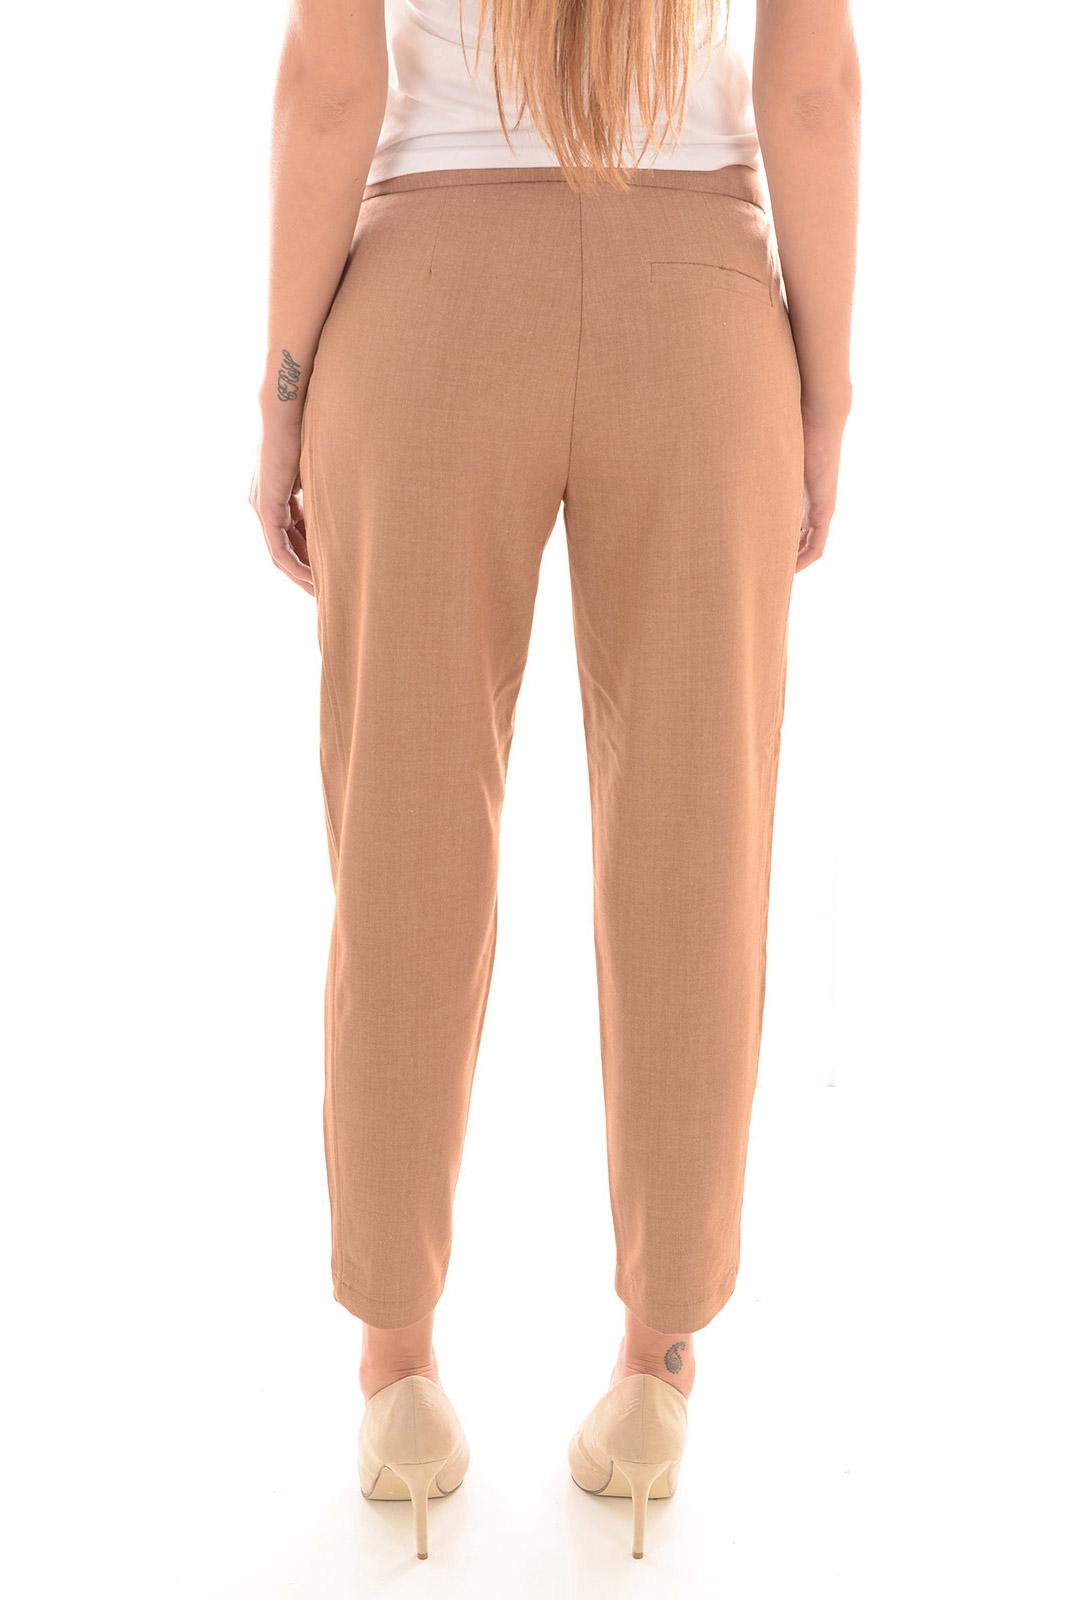 Pantalons  Vero moda VINCENT JOE NW ANGLE PANT A TOBACCO BROWN/MELANGE